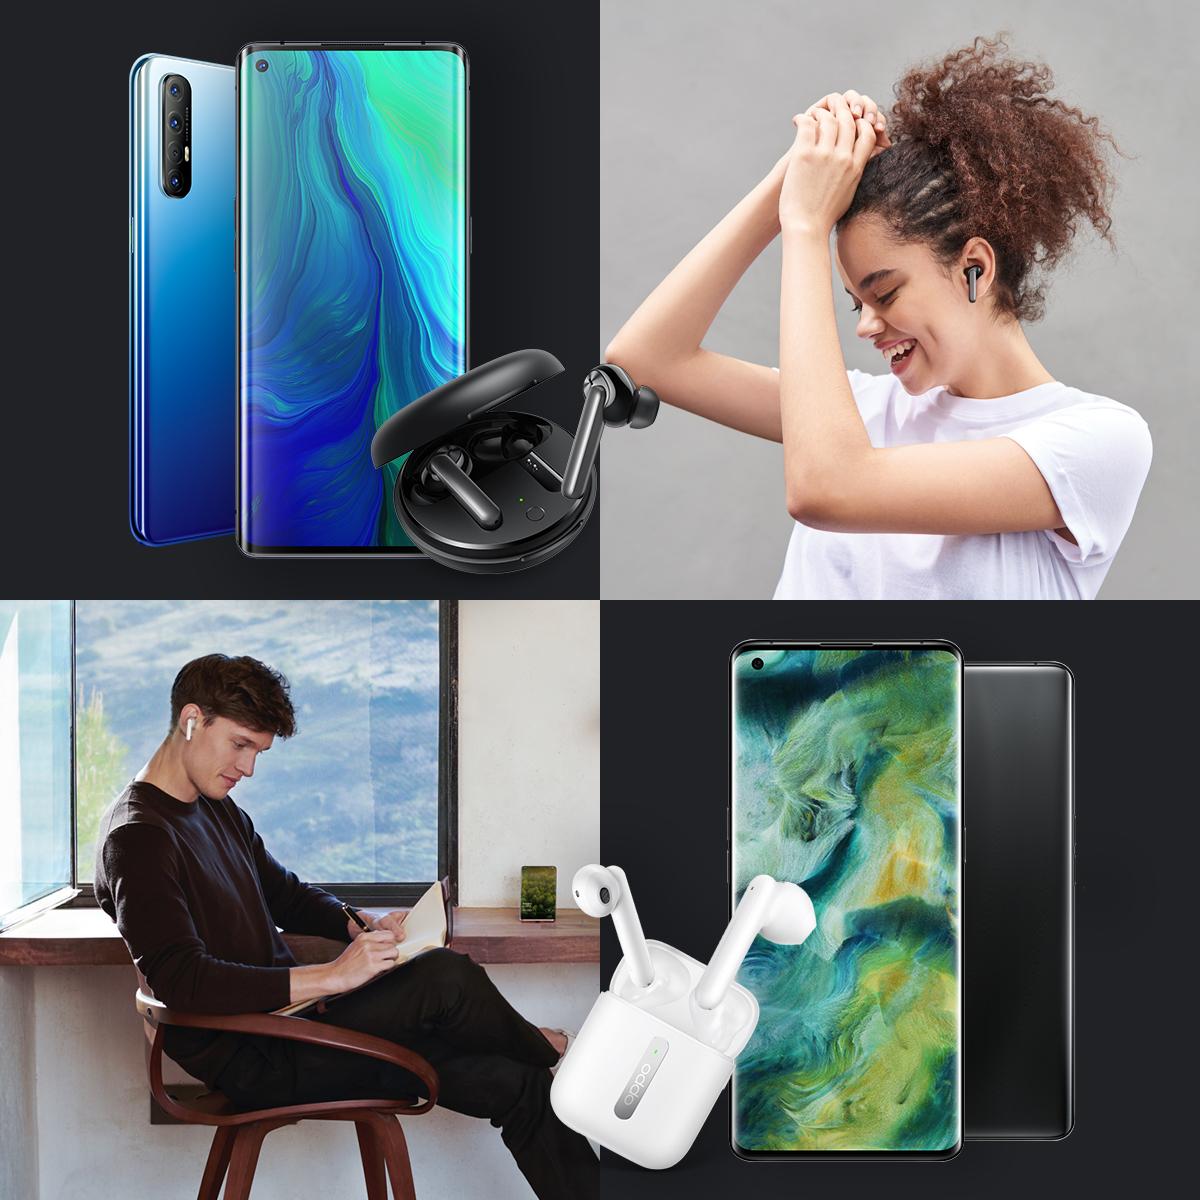 p-smartphoneurile-oppo-sunt-disponibile-pentru-precomanda